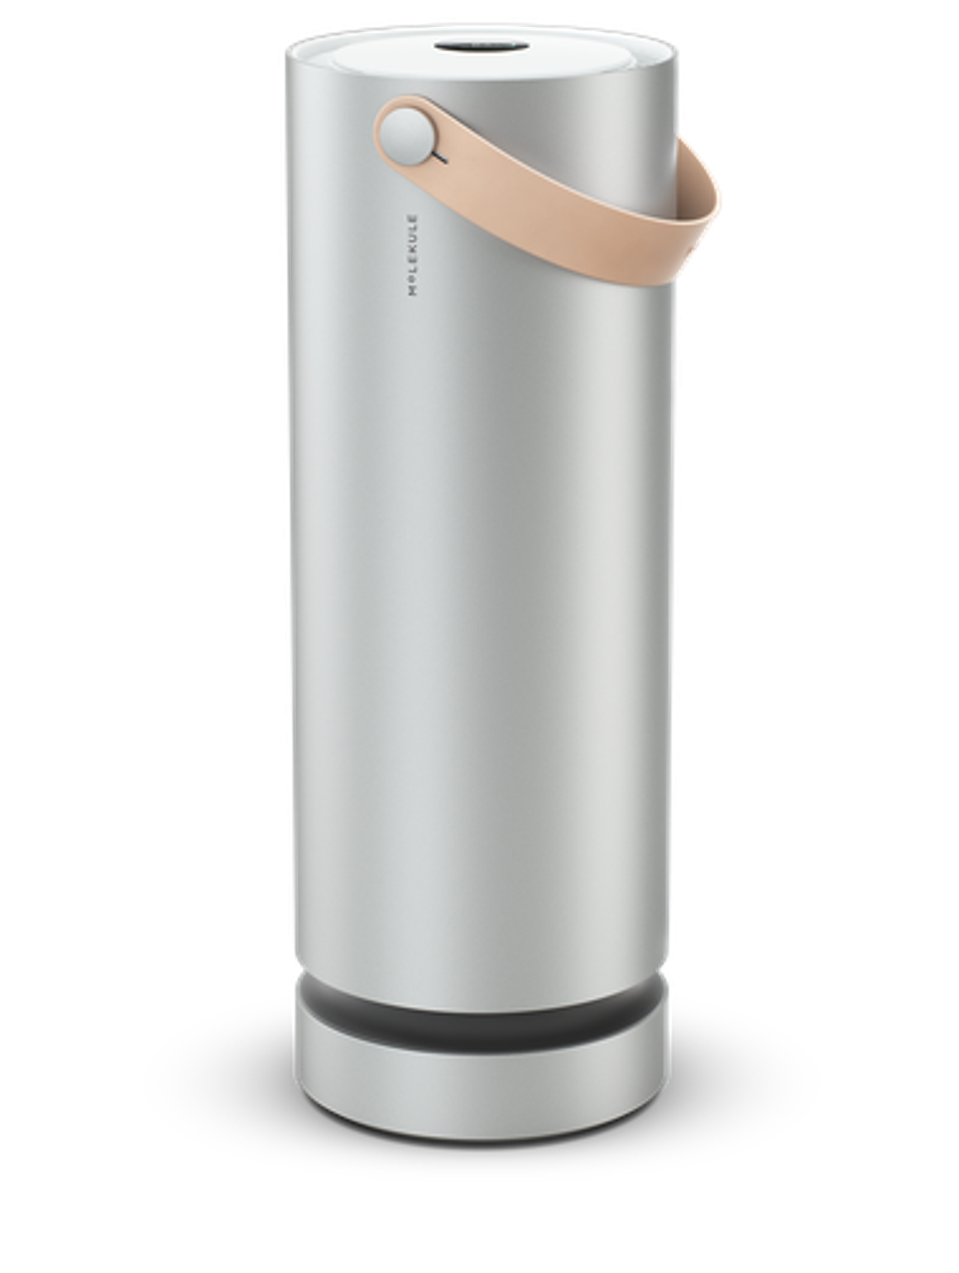 Molekule Air - Air Purifier for large rooms